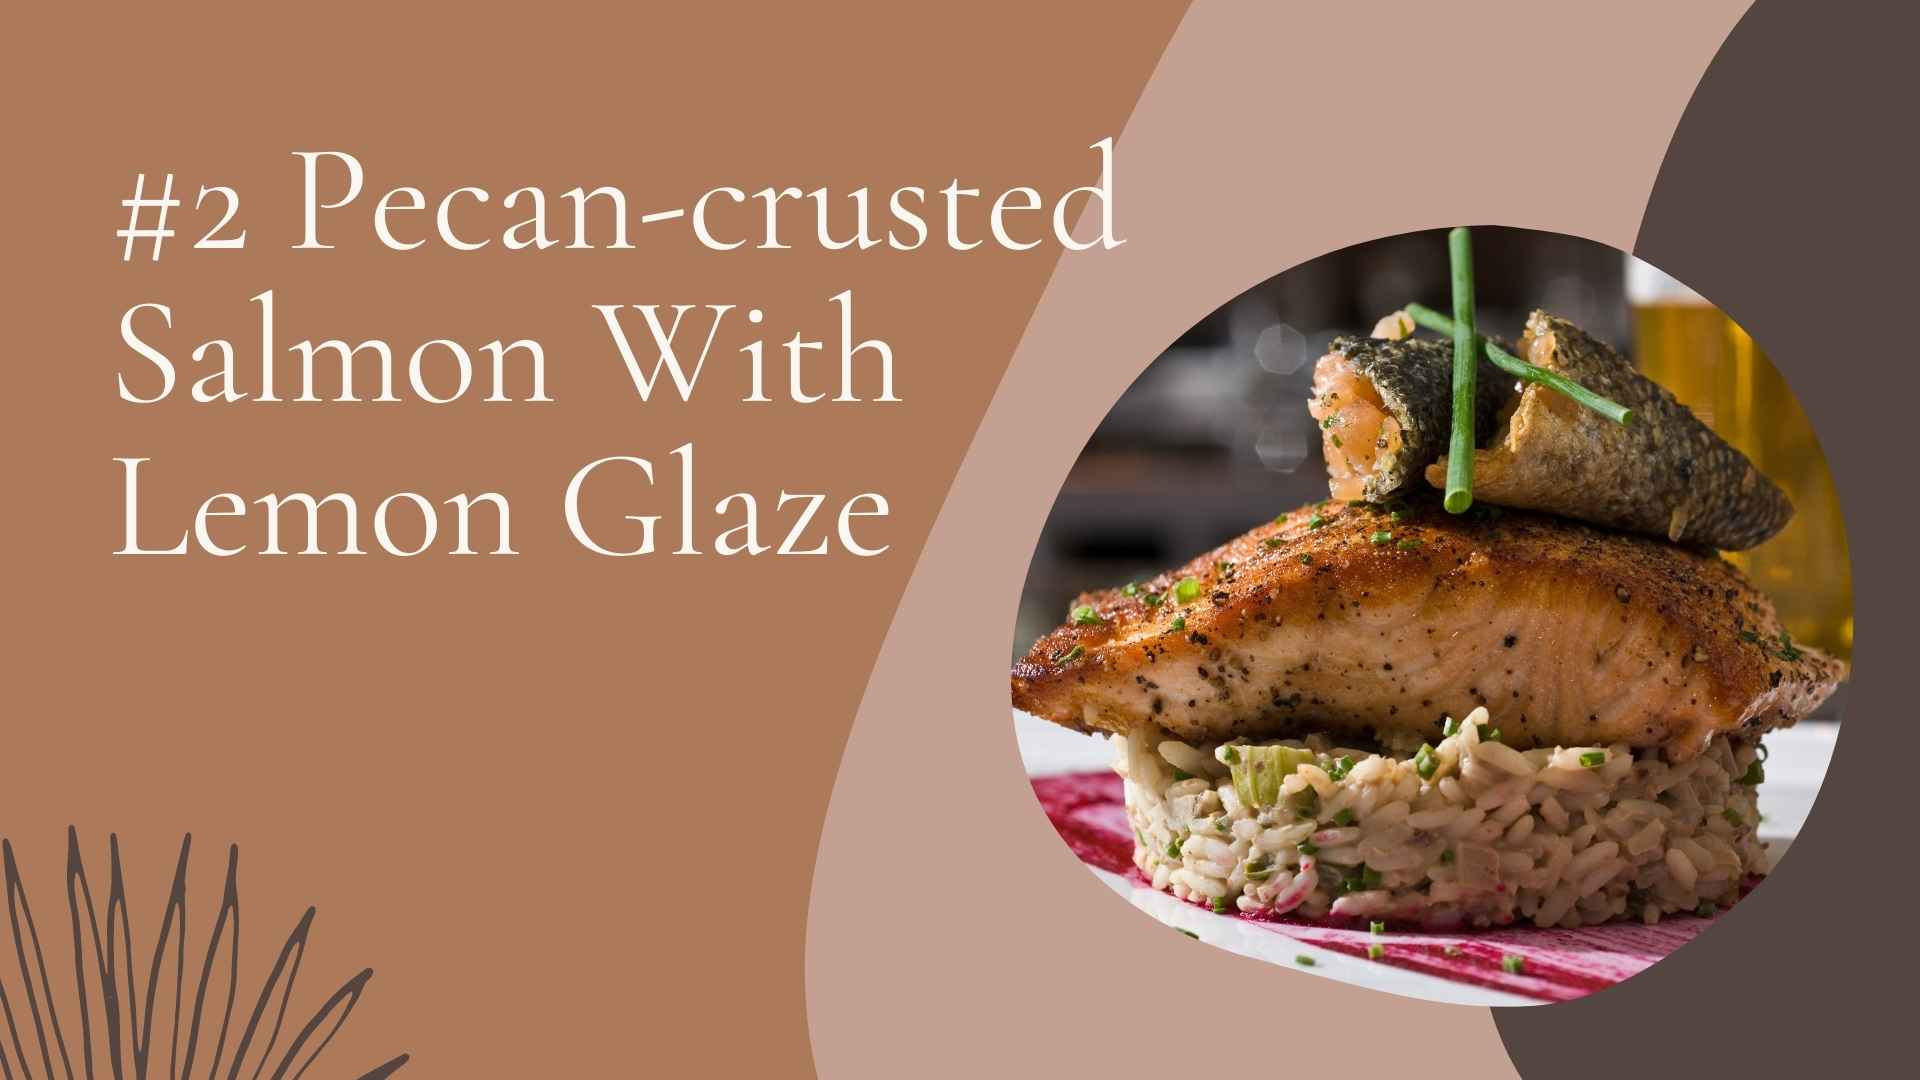 pecan-crusted salmon with lemon glaze